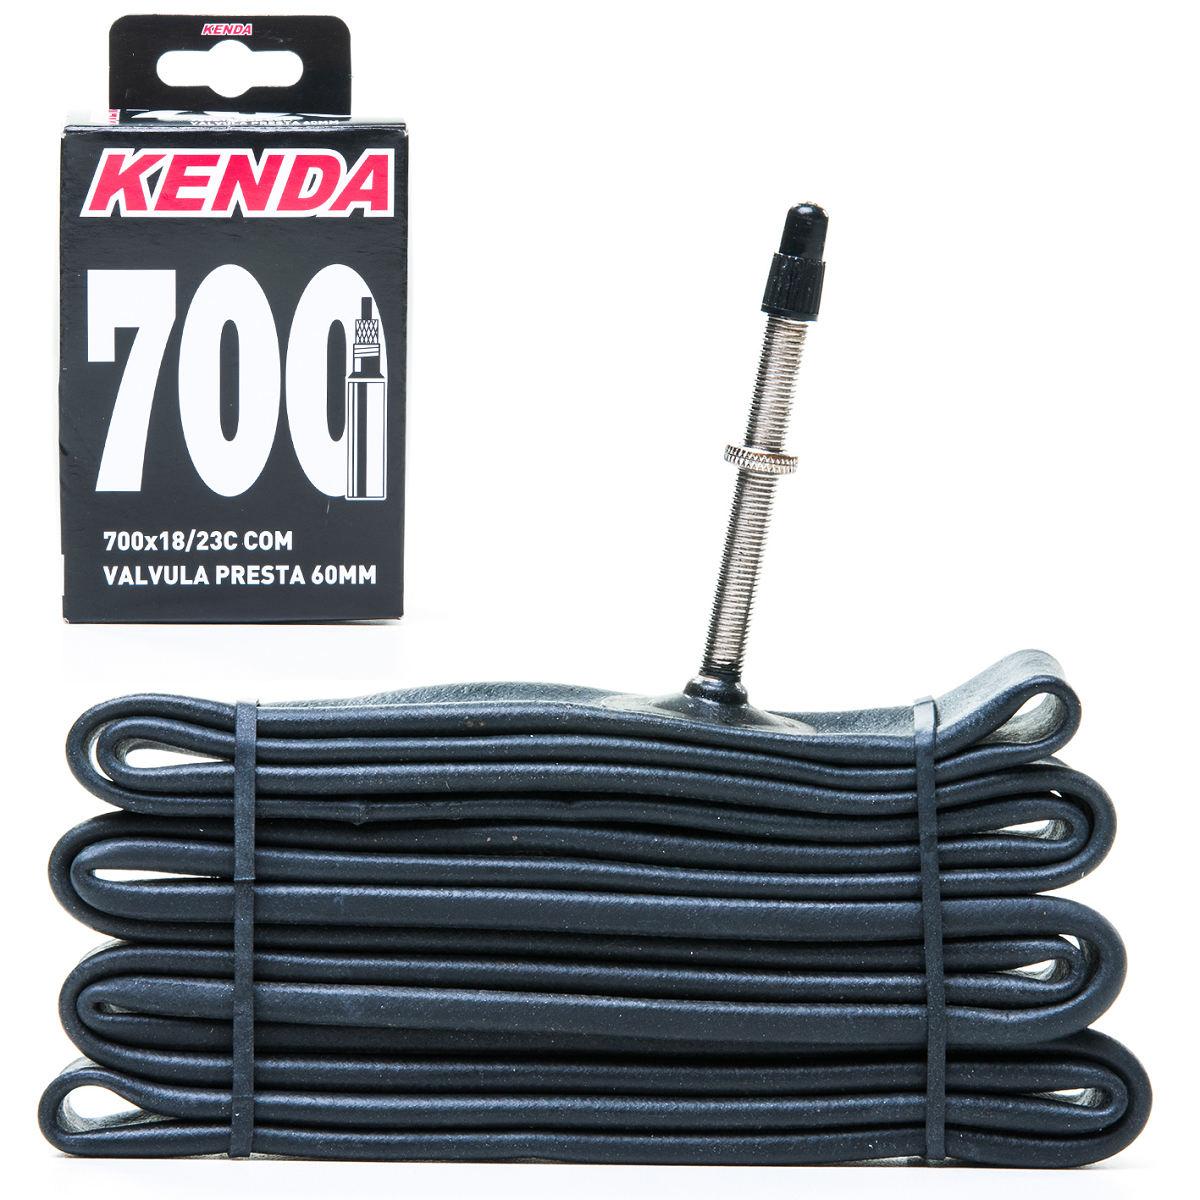 CAMARA DE AR KENDA 700X18/23C, PRESTA 60MM (40419)